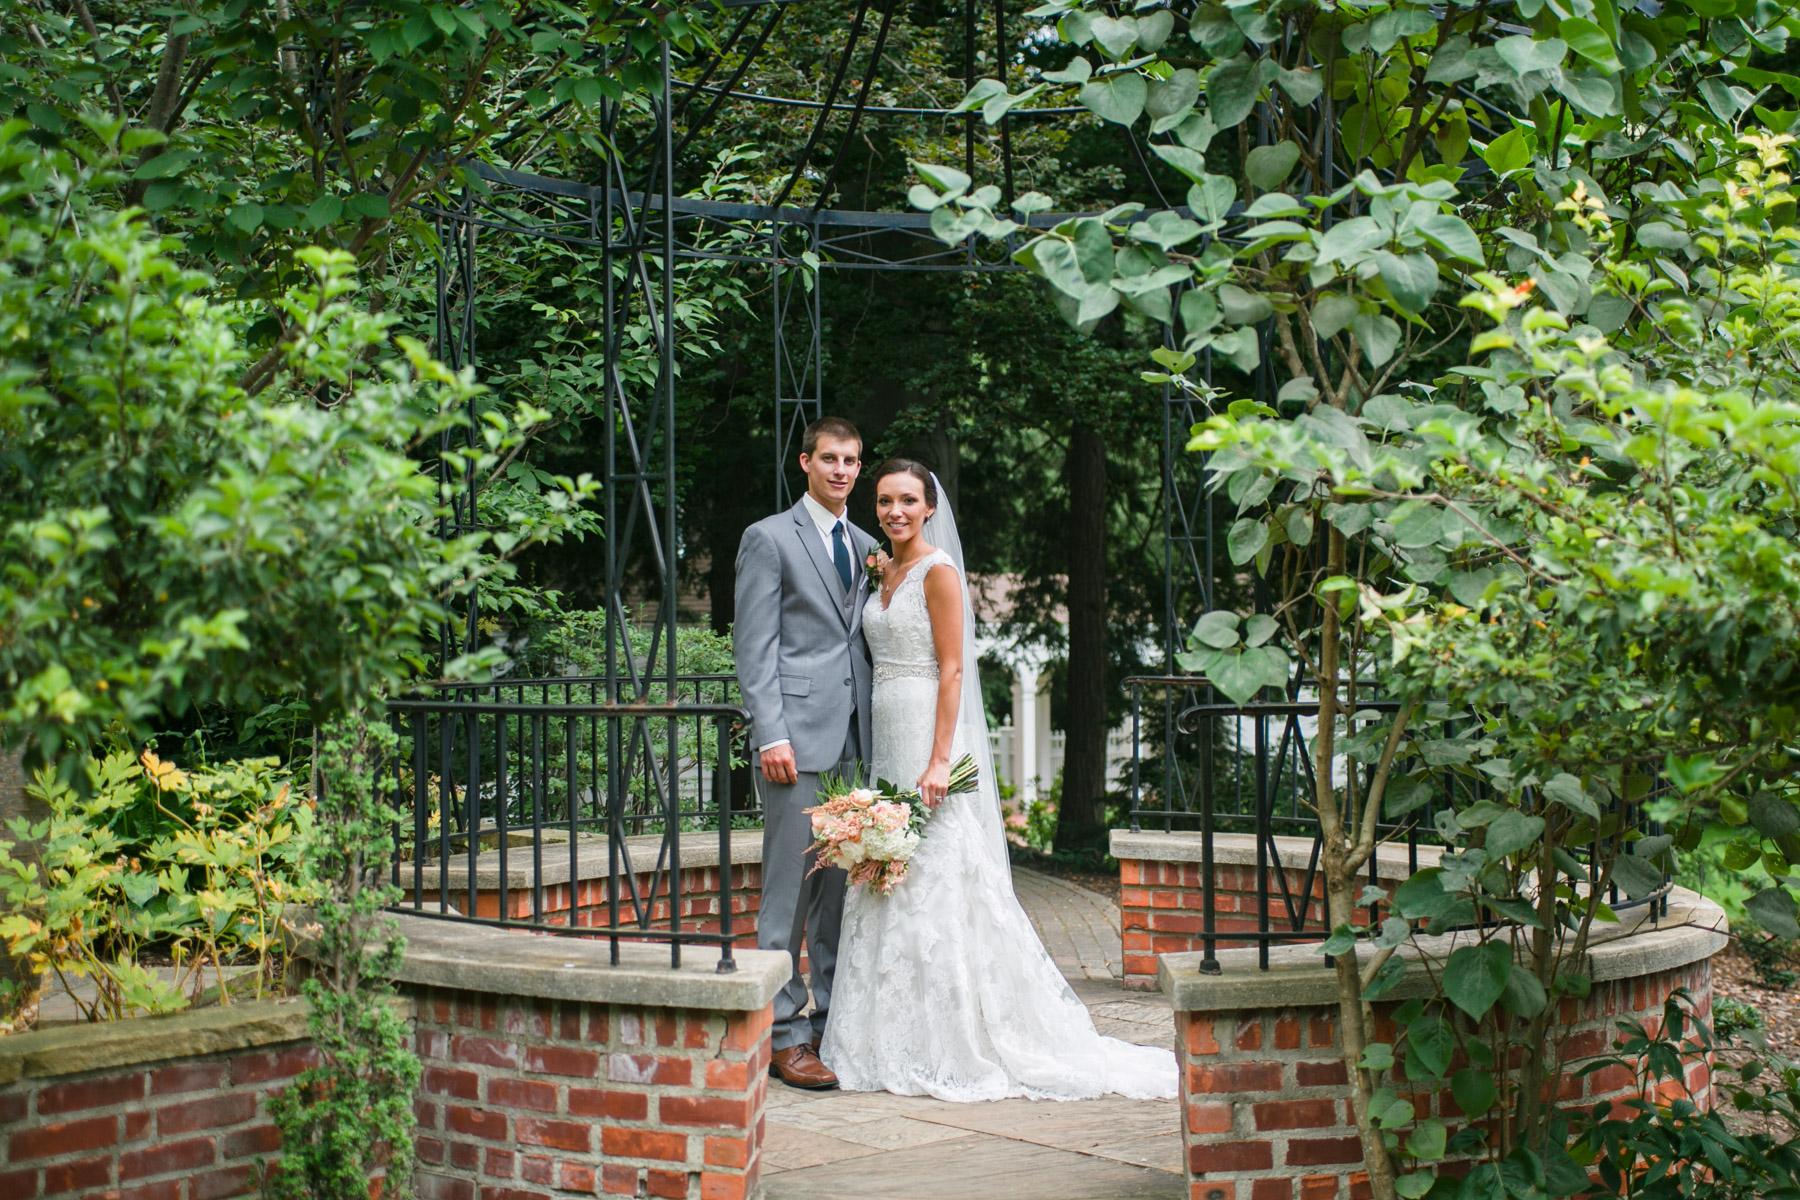 wildwood-park-wedding-photos-51.jpg